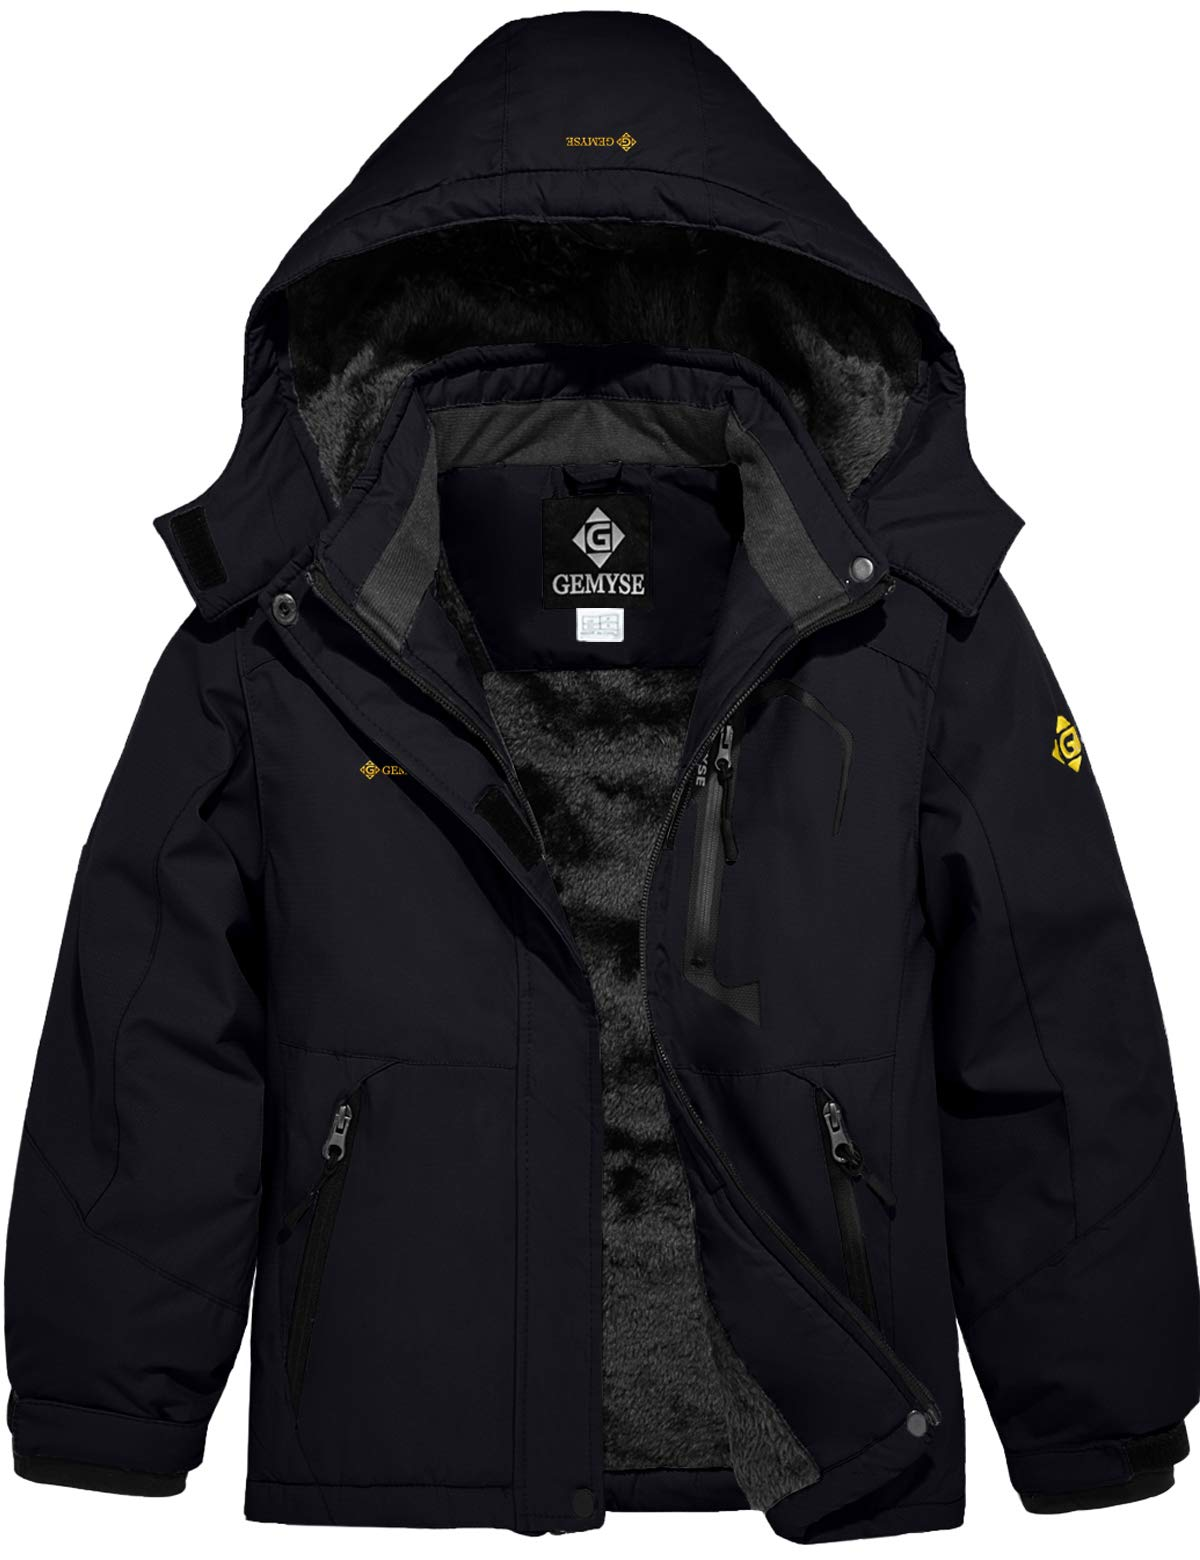 GEMYSE Girl's Waterproof Ski Snow Jacket Fleece Windproof Winter Jacket with Hood